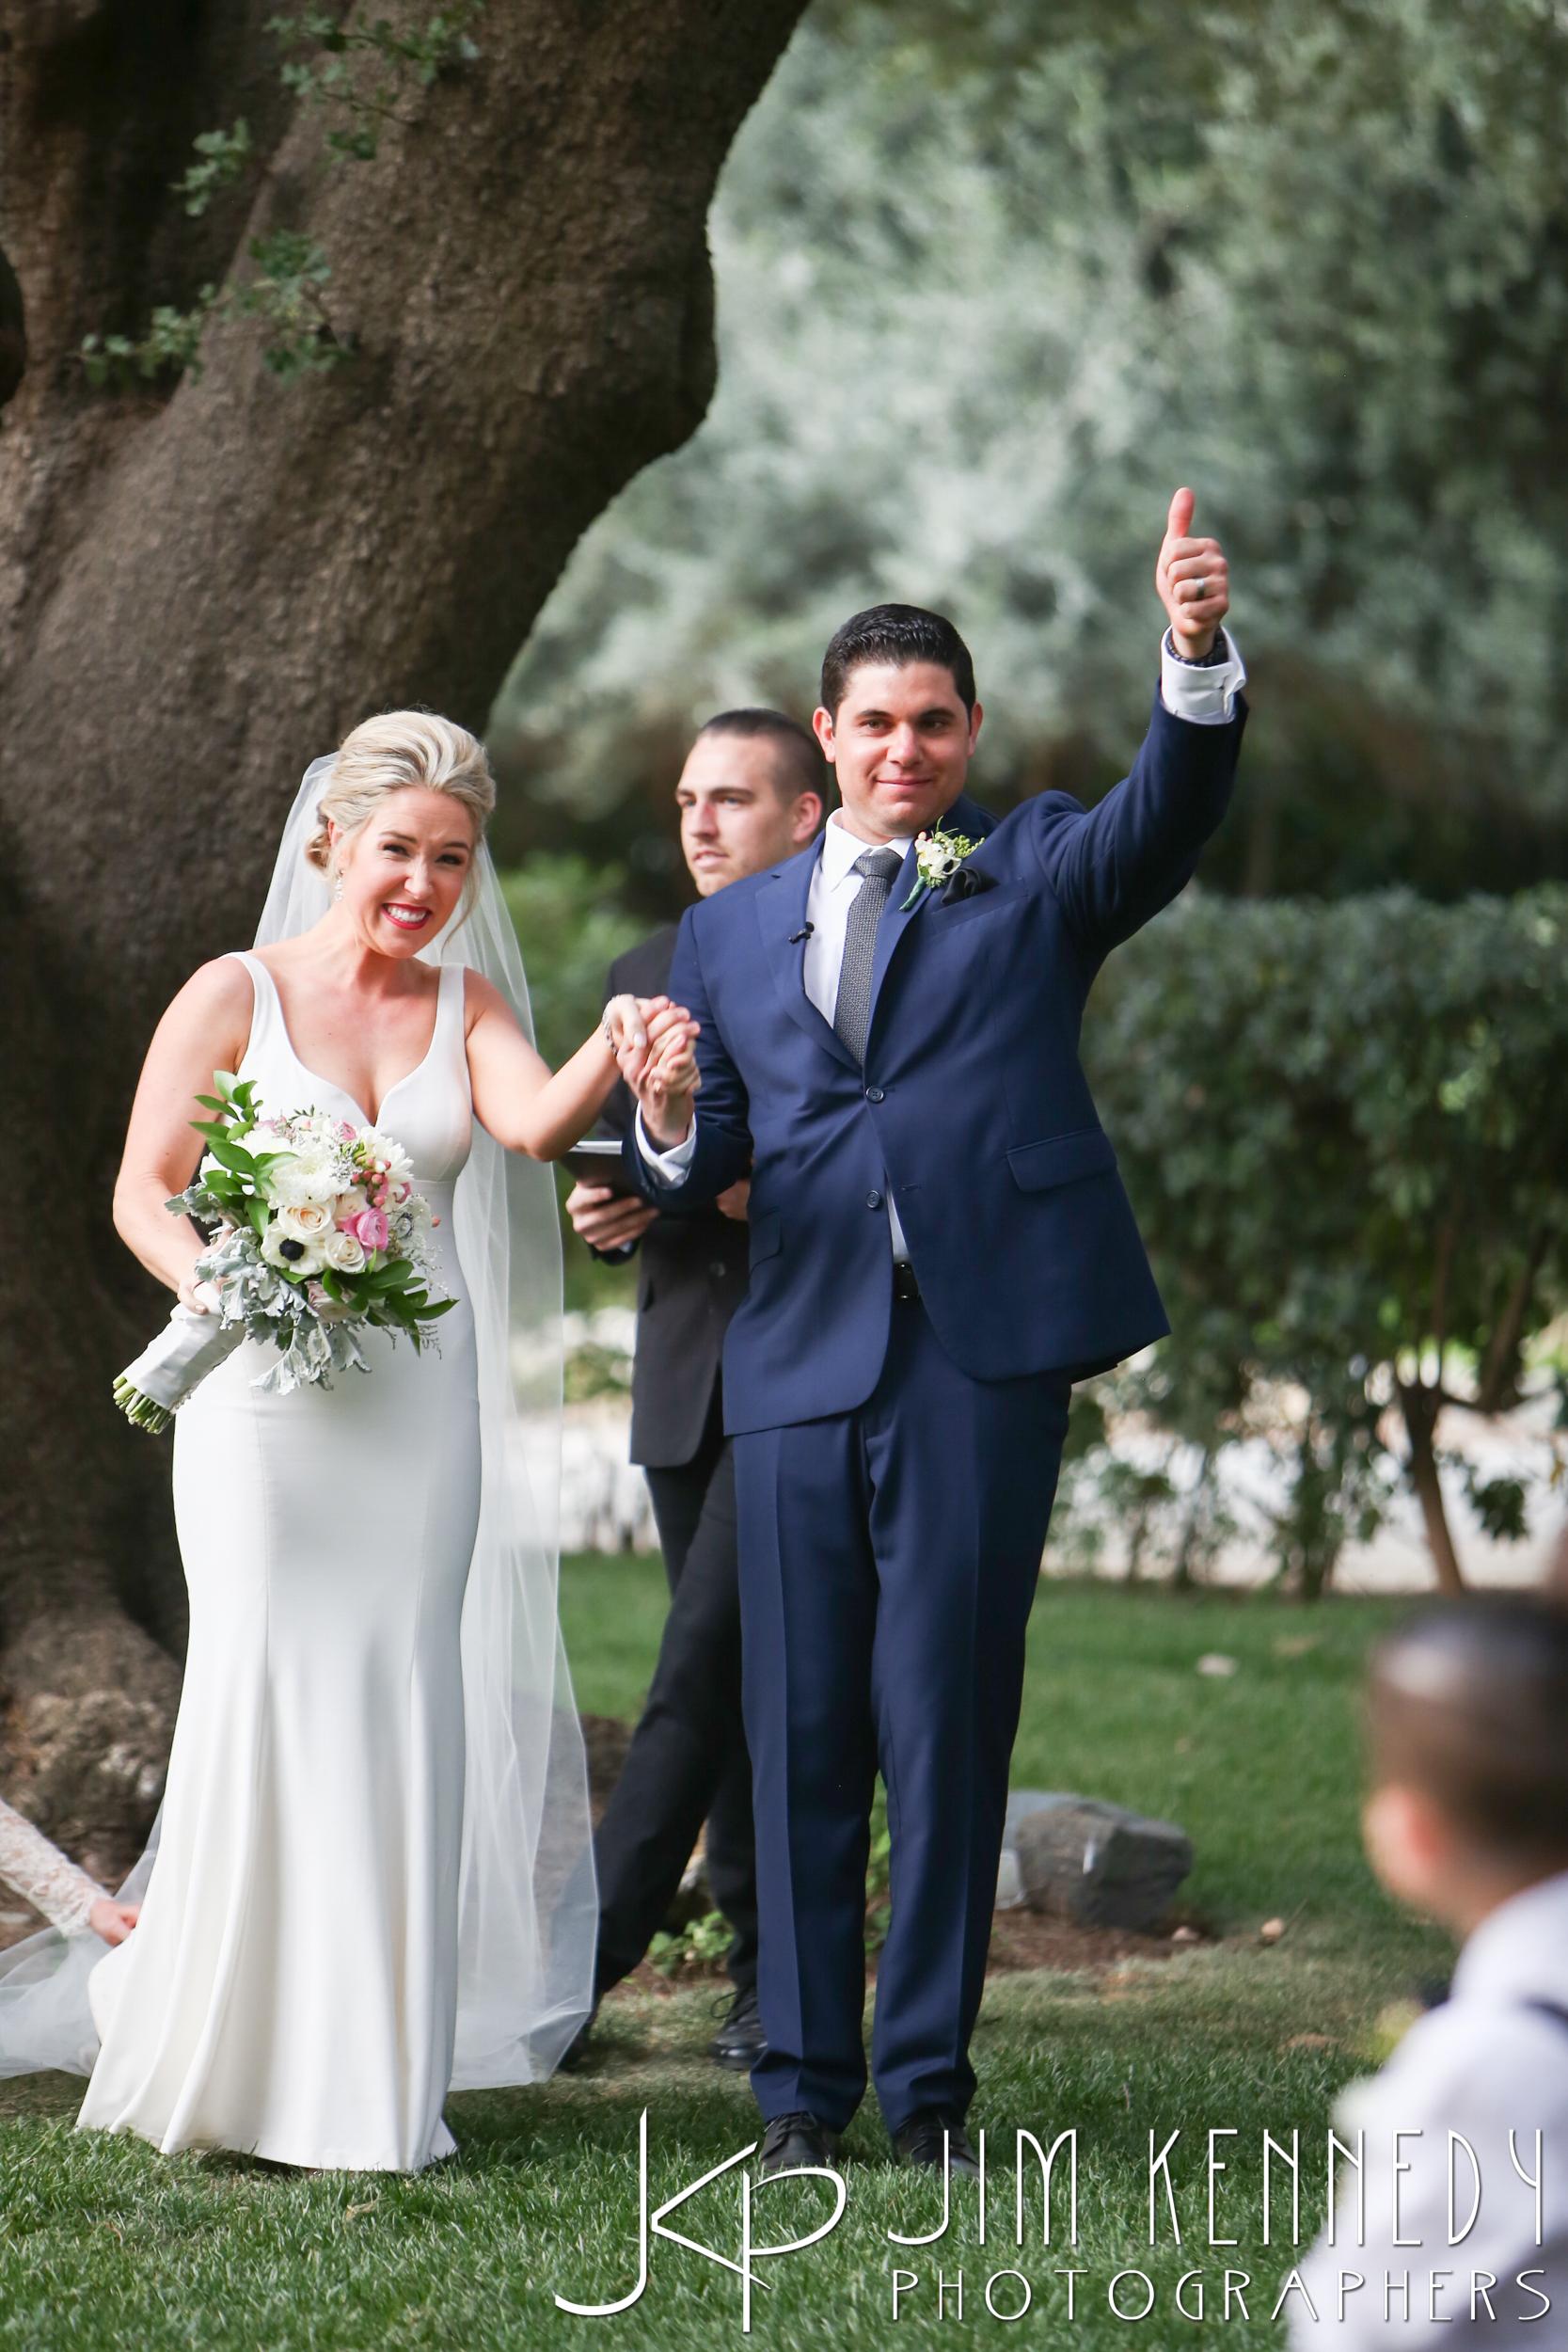 jim_kennedy_photographers_highland_springs_wedding_caitlyn_0121.jpg